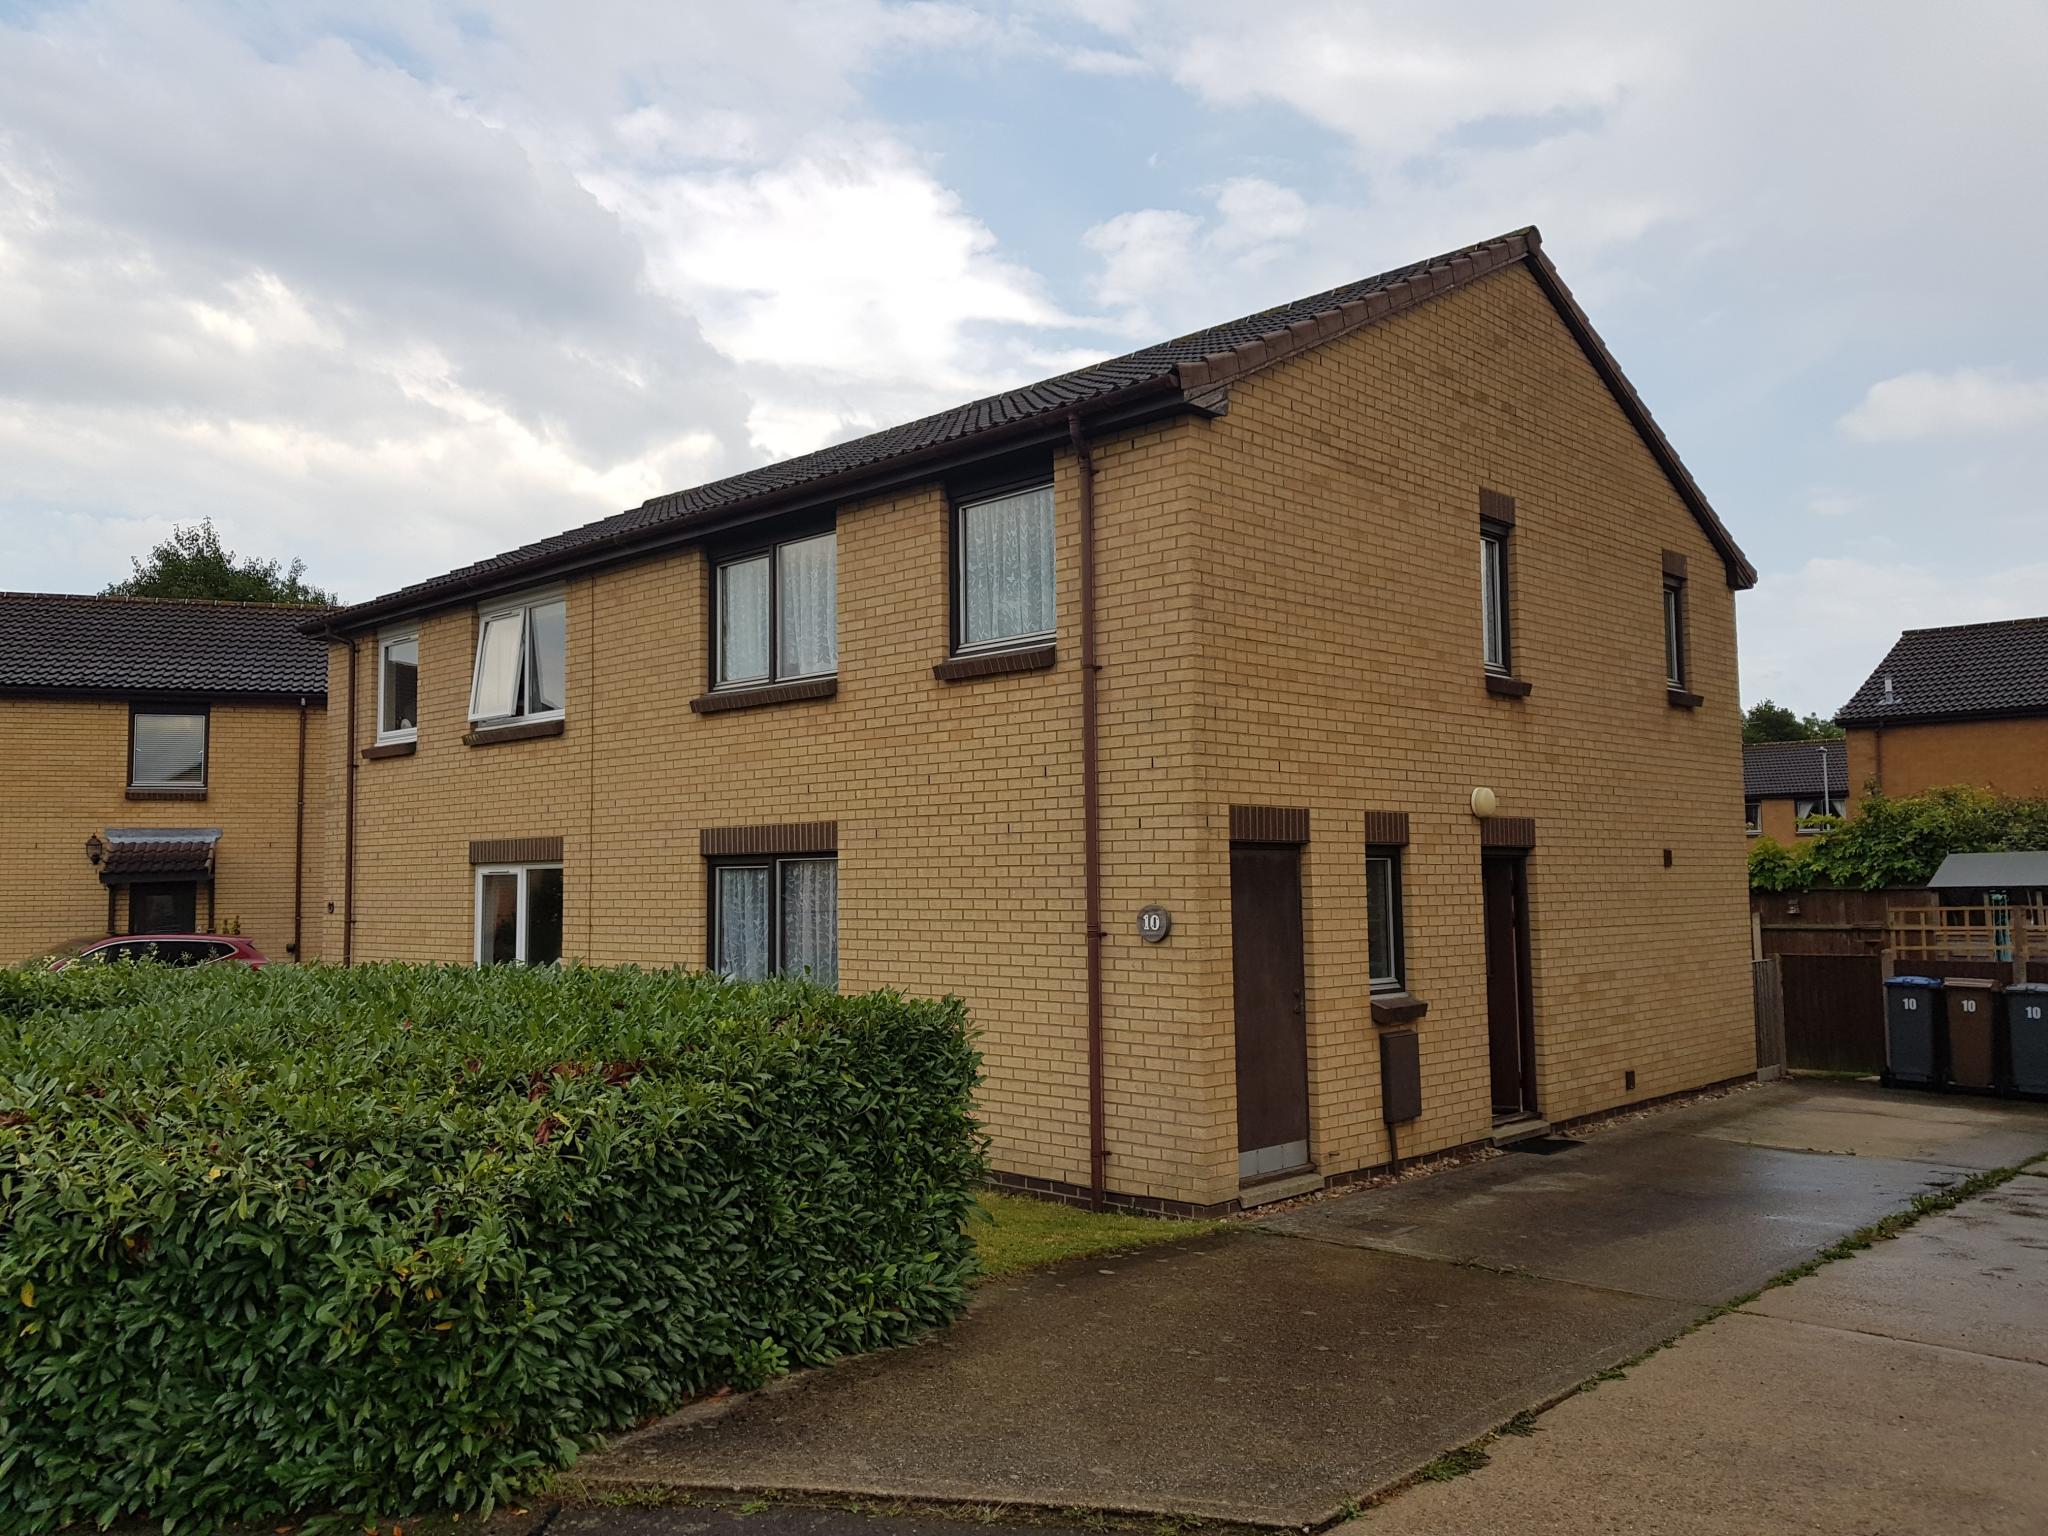 2 bedroom semi-detached house SSTC in Rendlesham, Woodbridge - Photograph 1